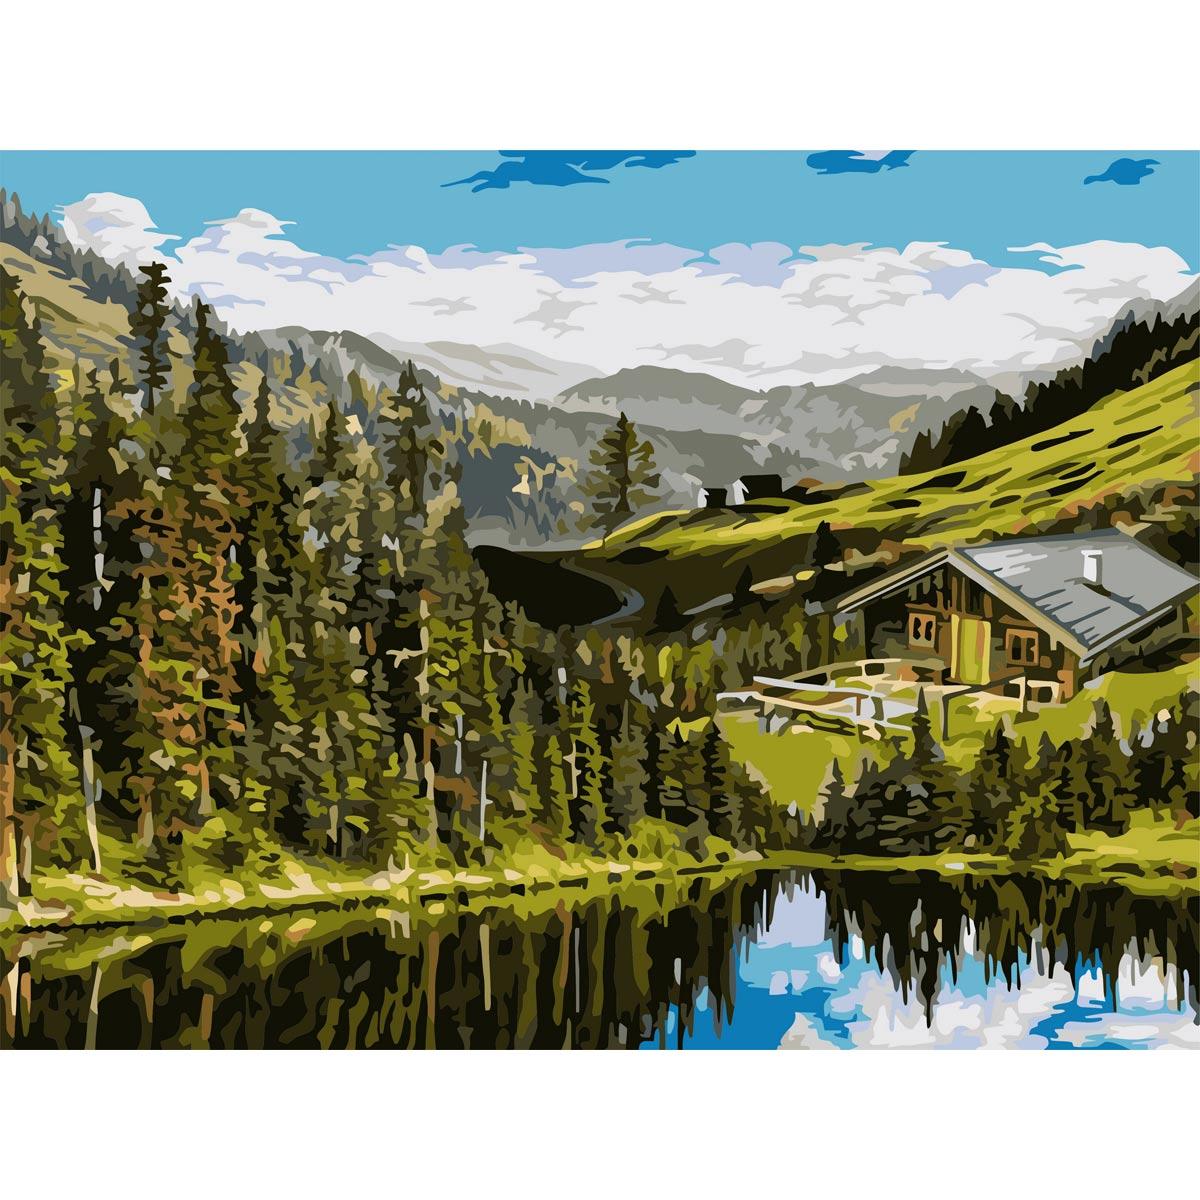 A139 Набор для рисования по номерам 'Домик на холмах' 40*50см